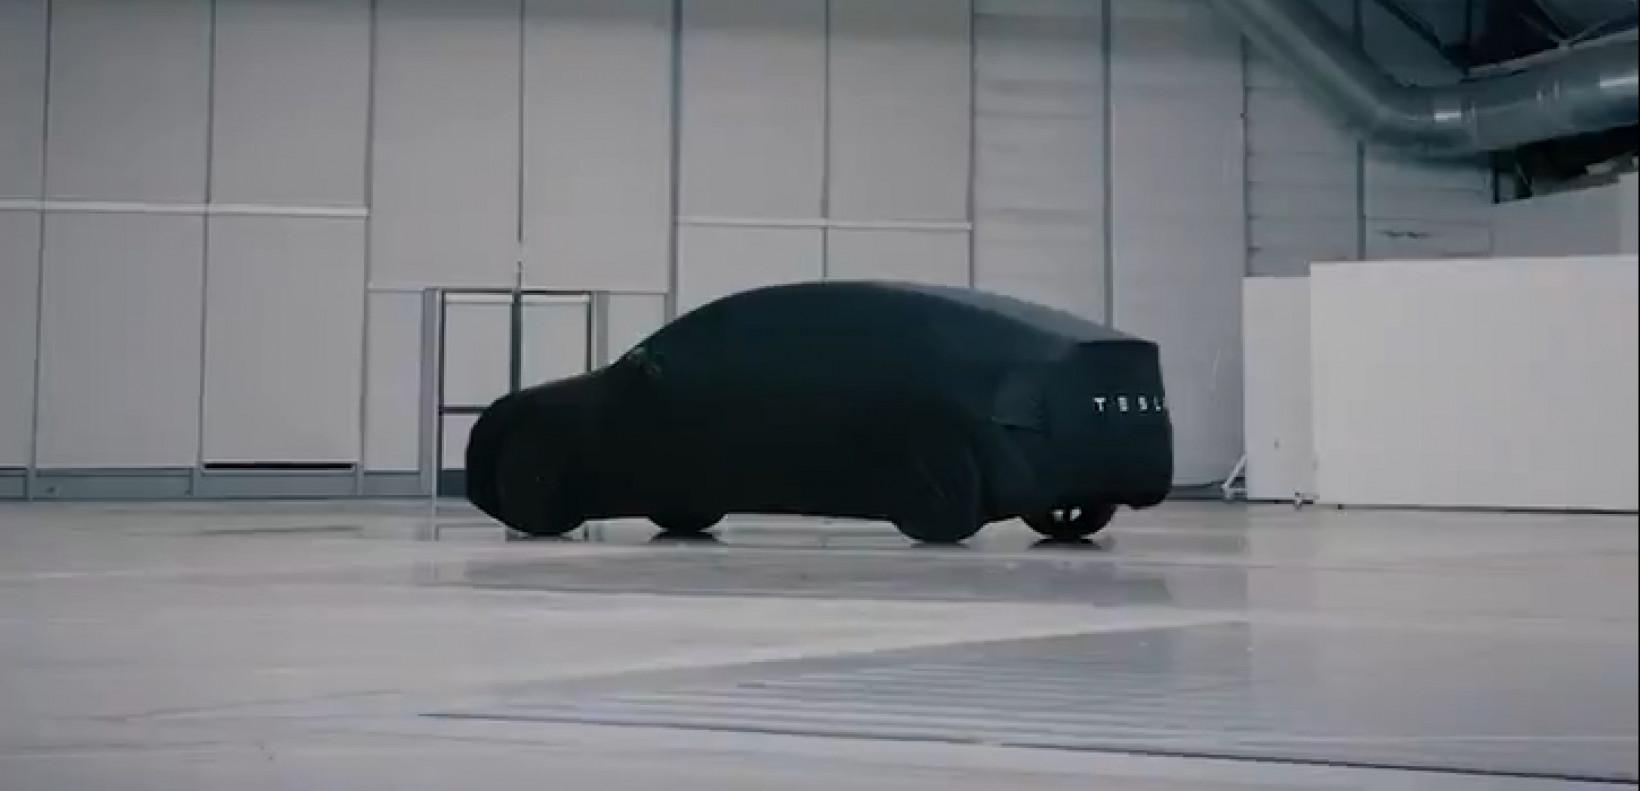 How to watch Elon Musk reveal Tesla's Model Y SUV tonight